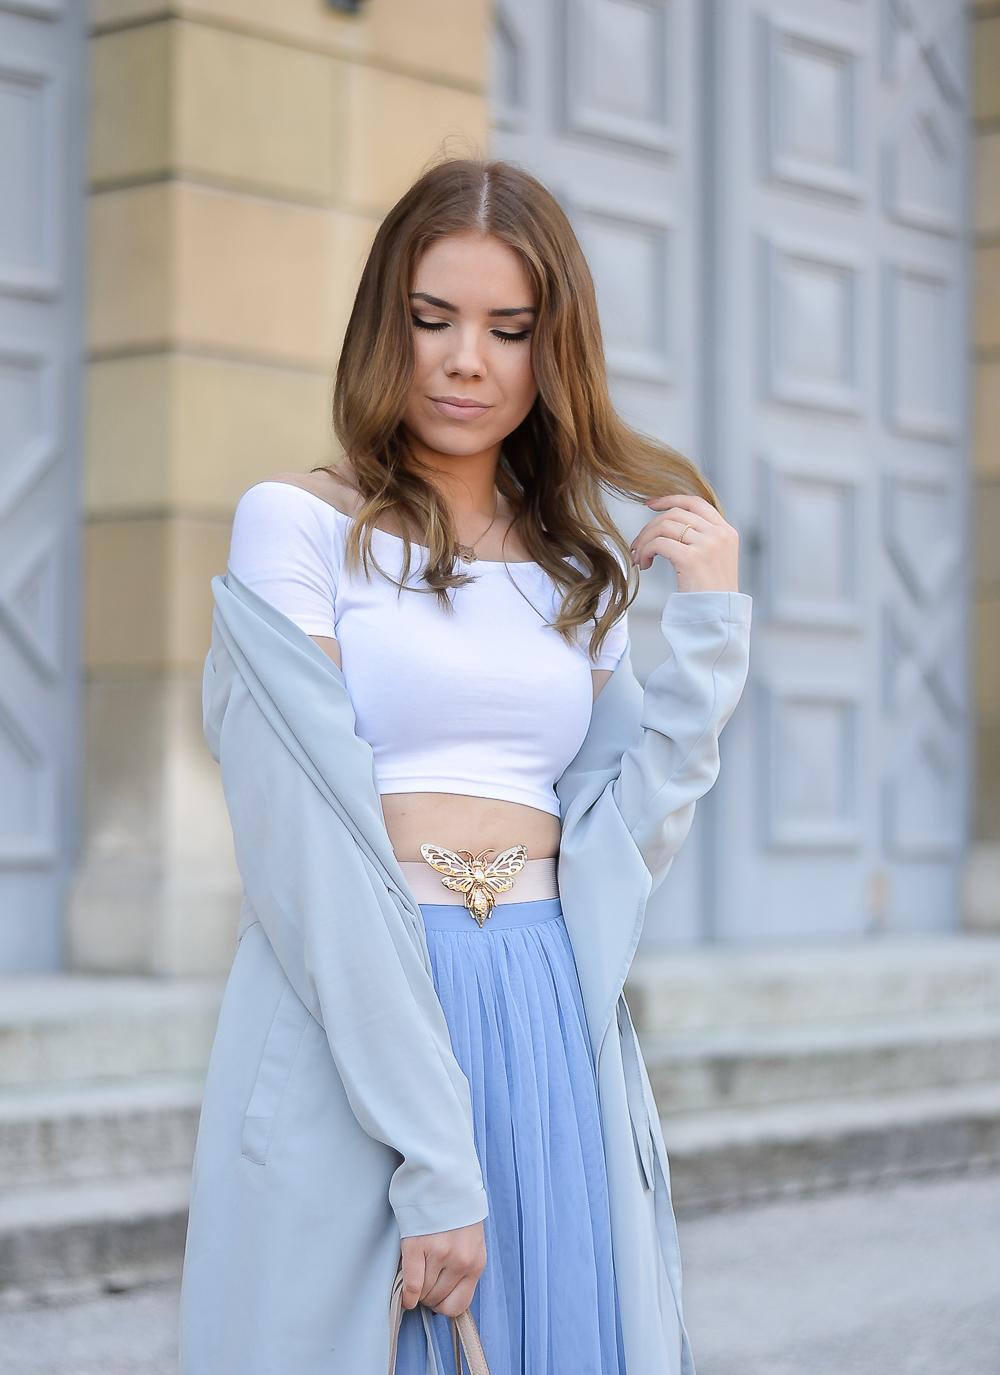 Fashion Blog Munich-Kindheitserinnerung-Kurzes-T-Shirt-rosa-Taillengürtel-blauer-Tüllrock-dünner-Mantel-Halbkörper-Foto